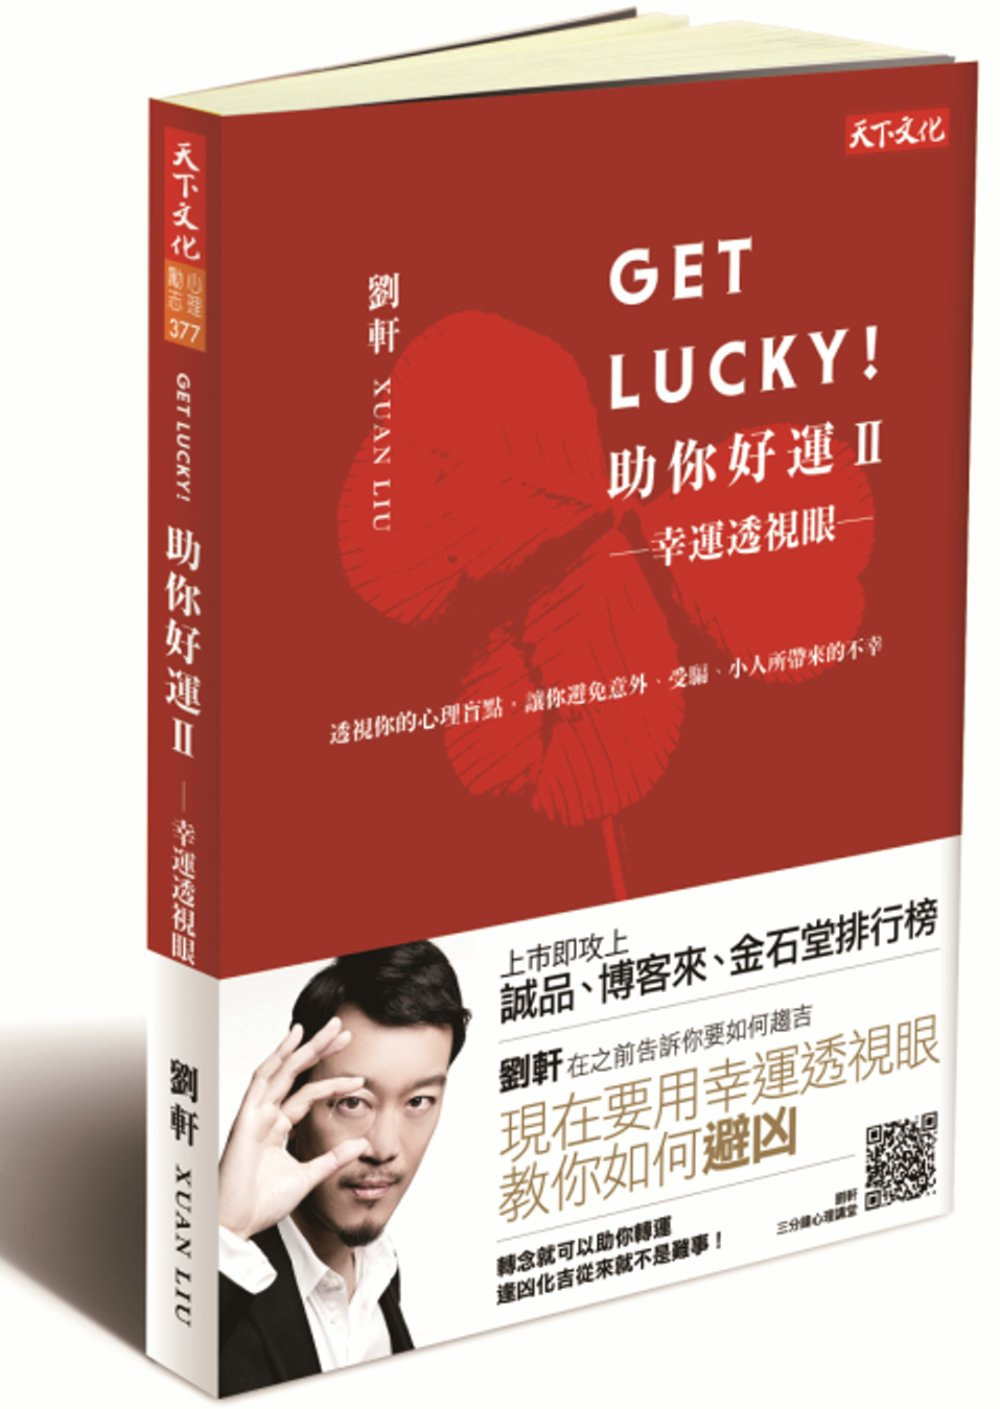 Get Lucky! 助你好运Ⅱ:幸运透视眼(幸运草封面版)